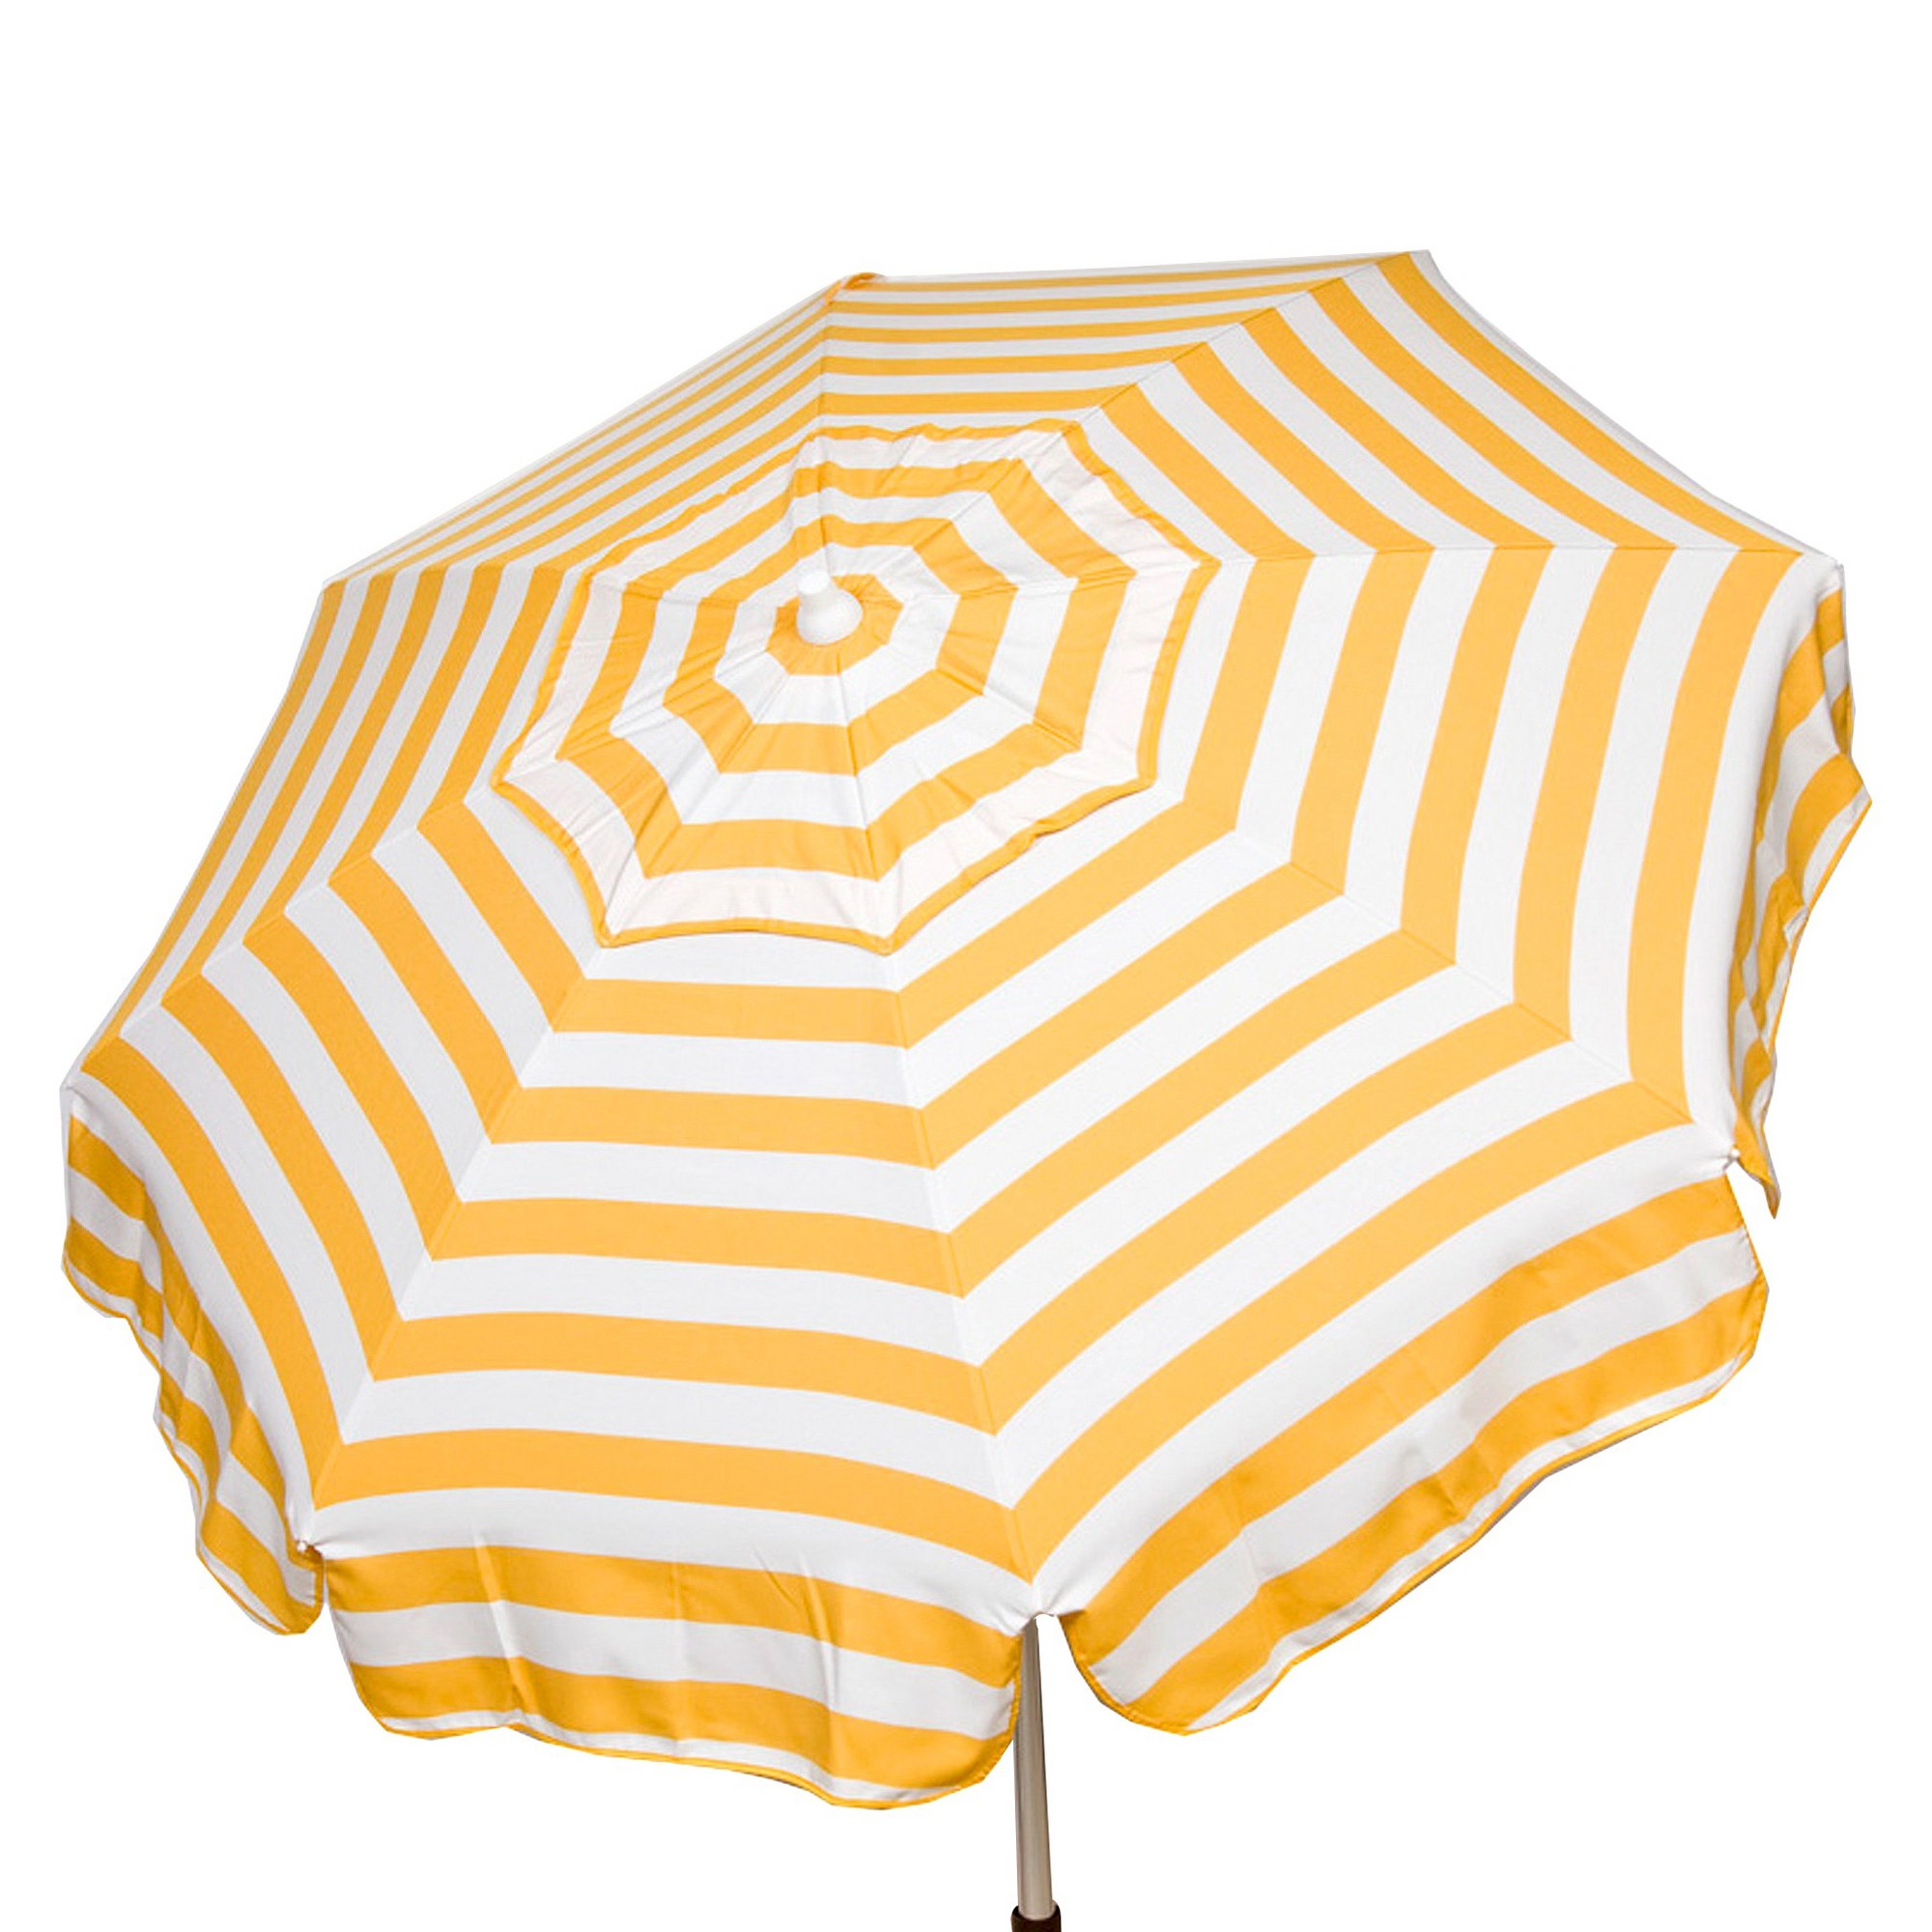 Parasol 6' Italian Aluminum Collar Tilt Beach Umbrella